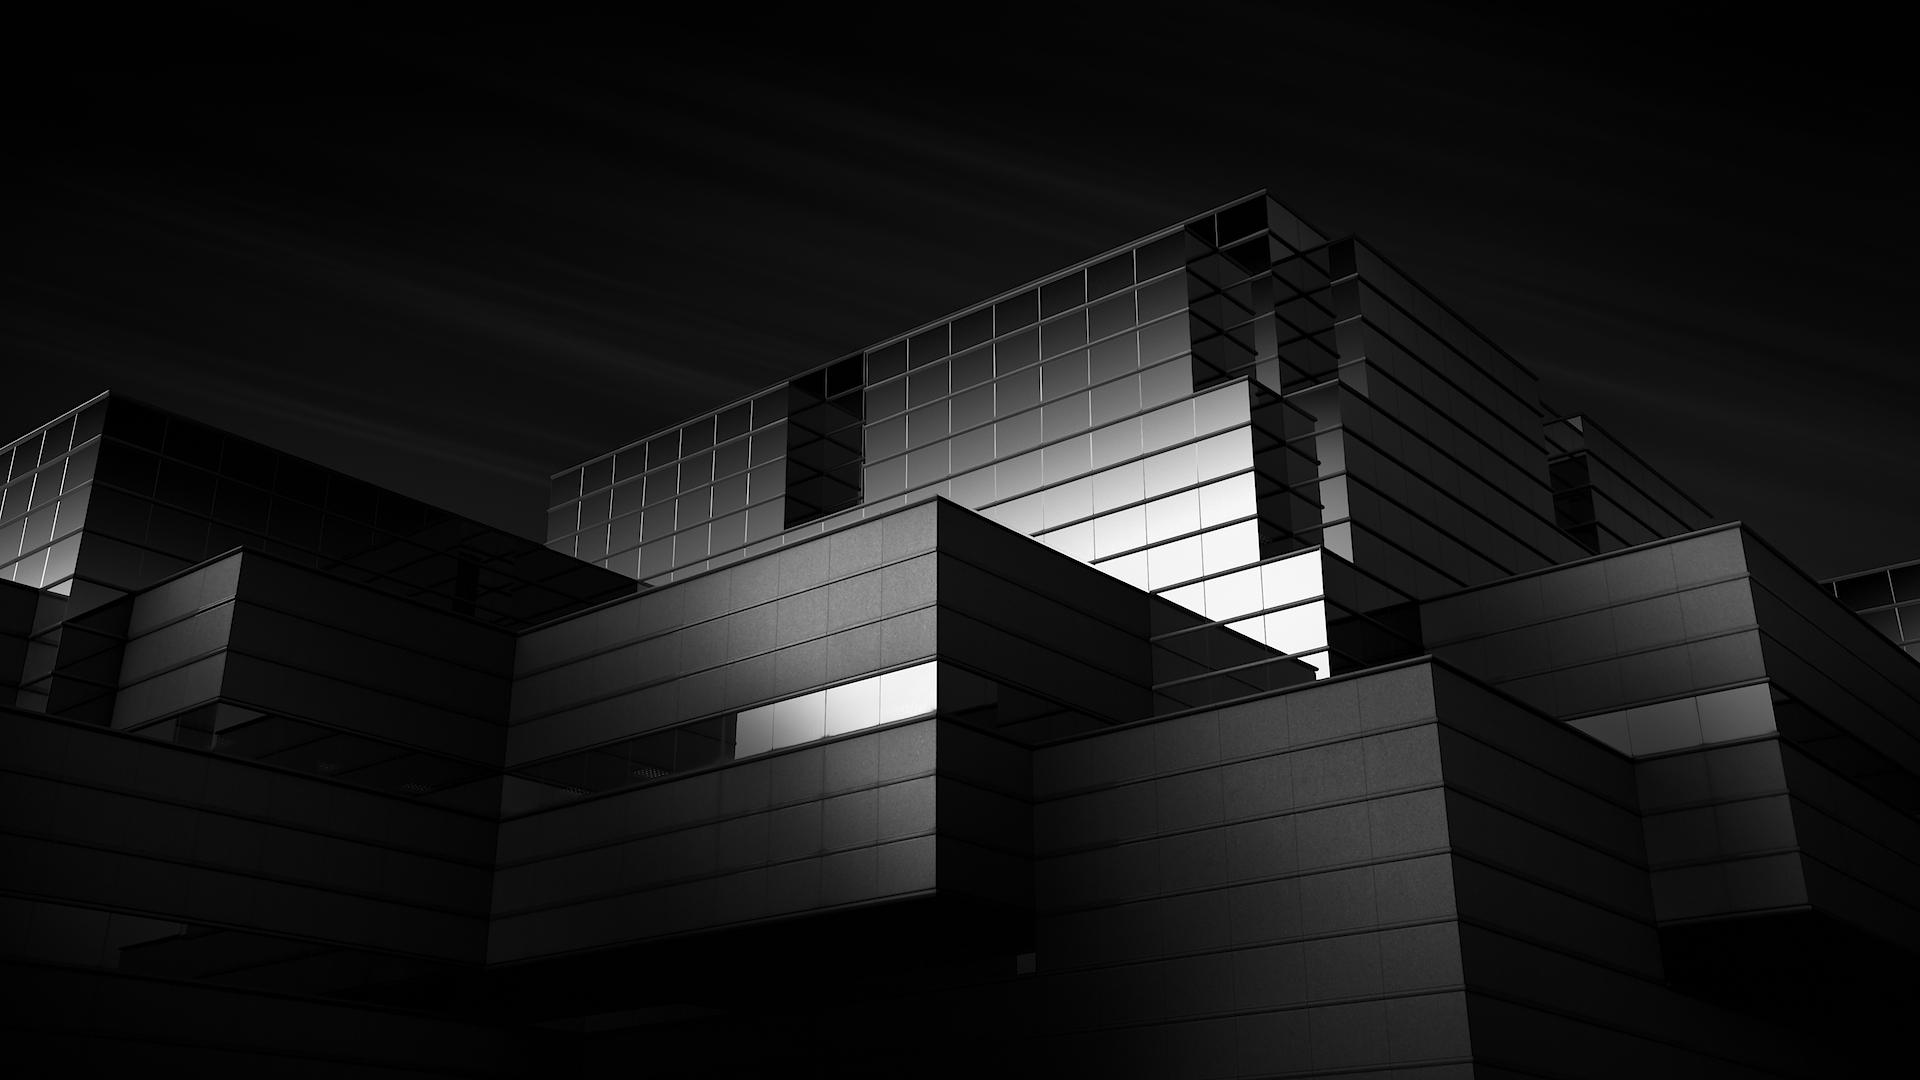 architectural moody mikami jin digital